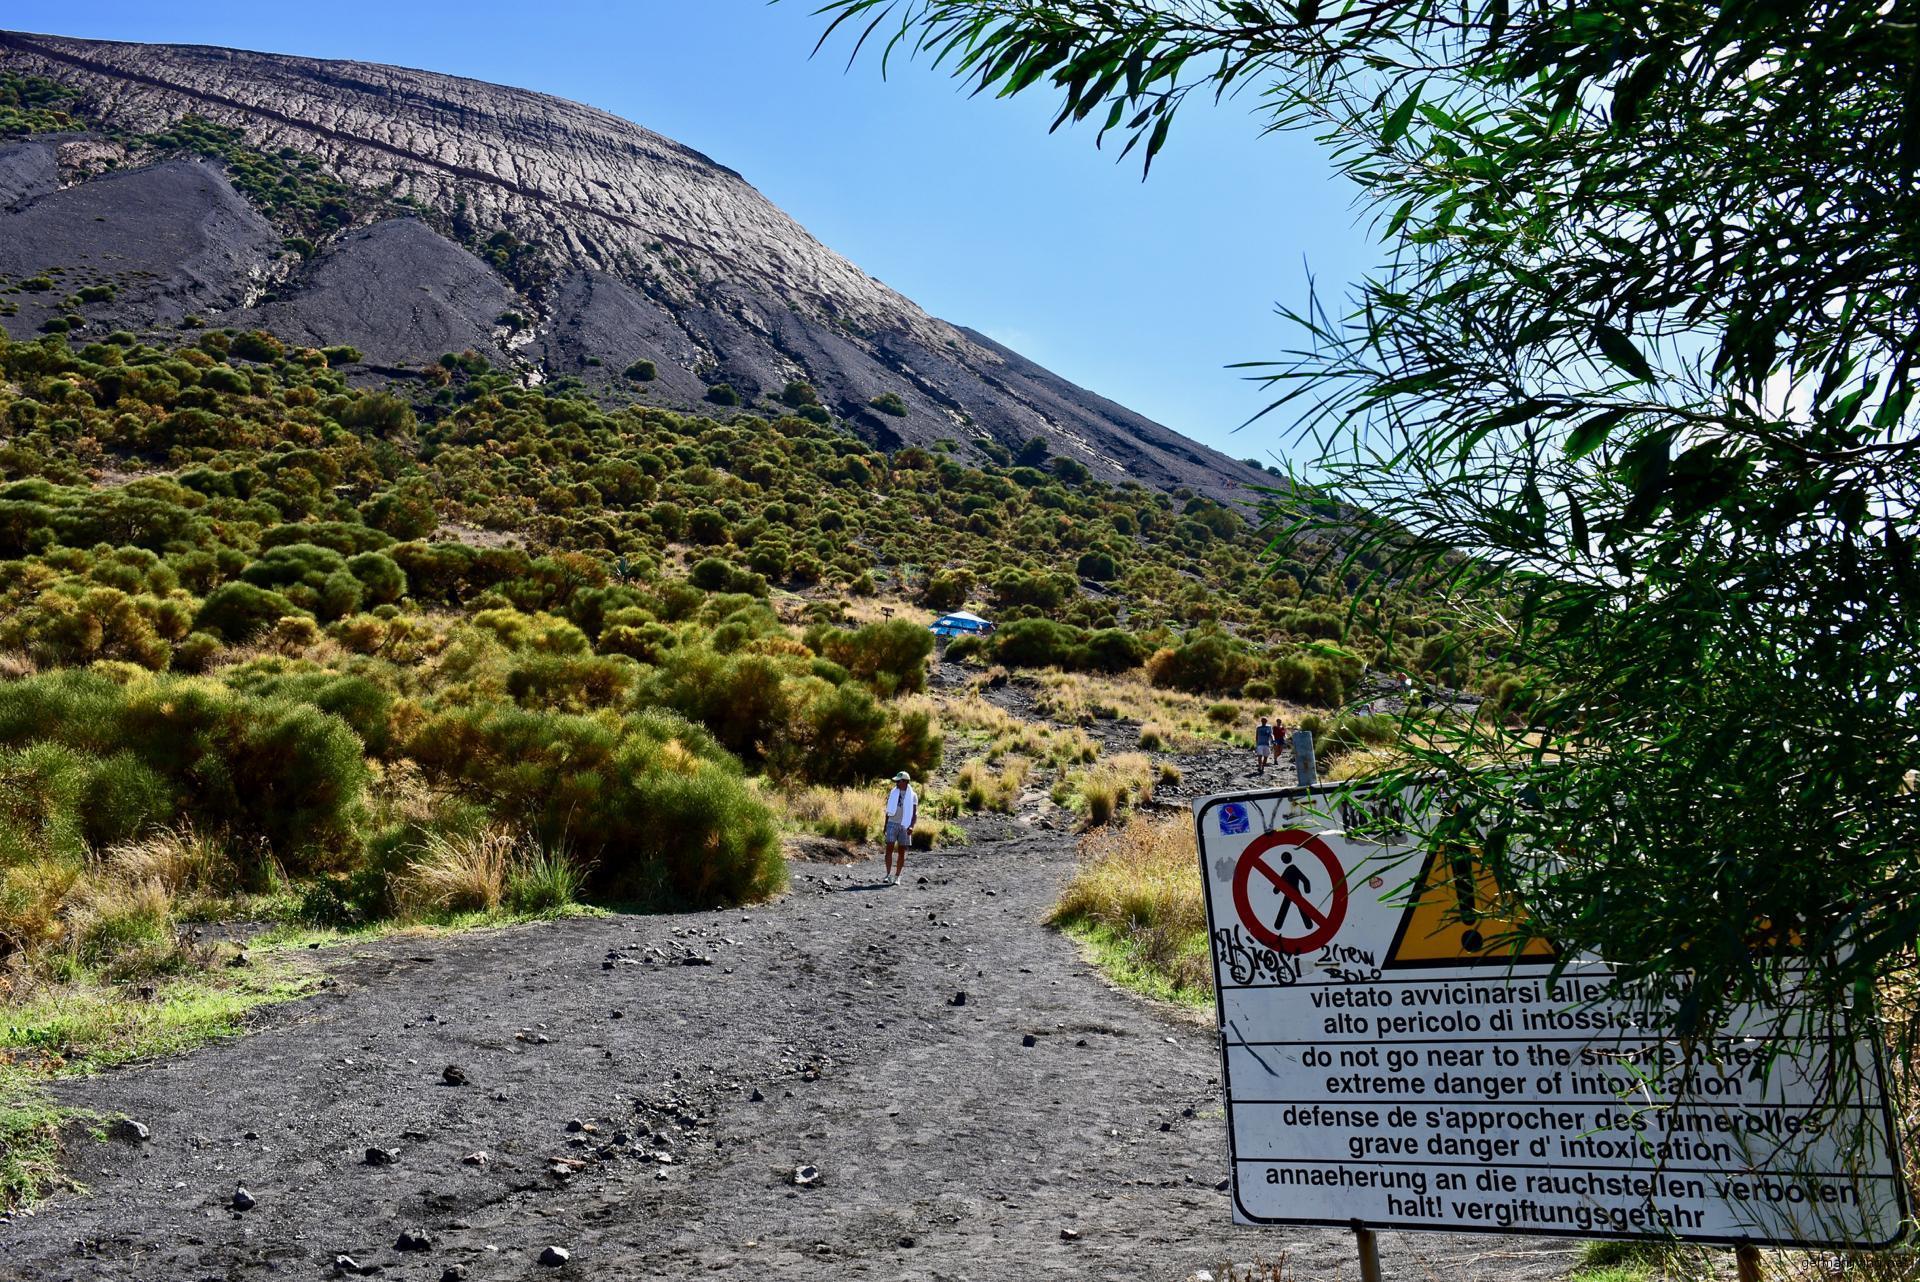 Beginn des Wanderweges zur Fossa di Vulcano - Liparische Inseln